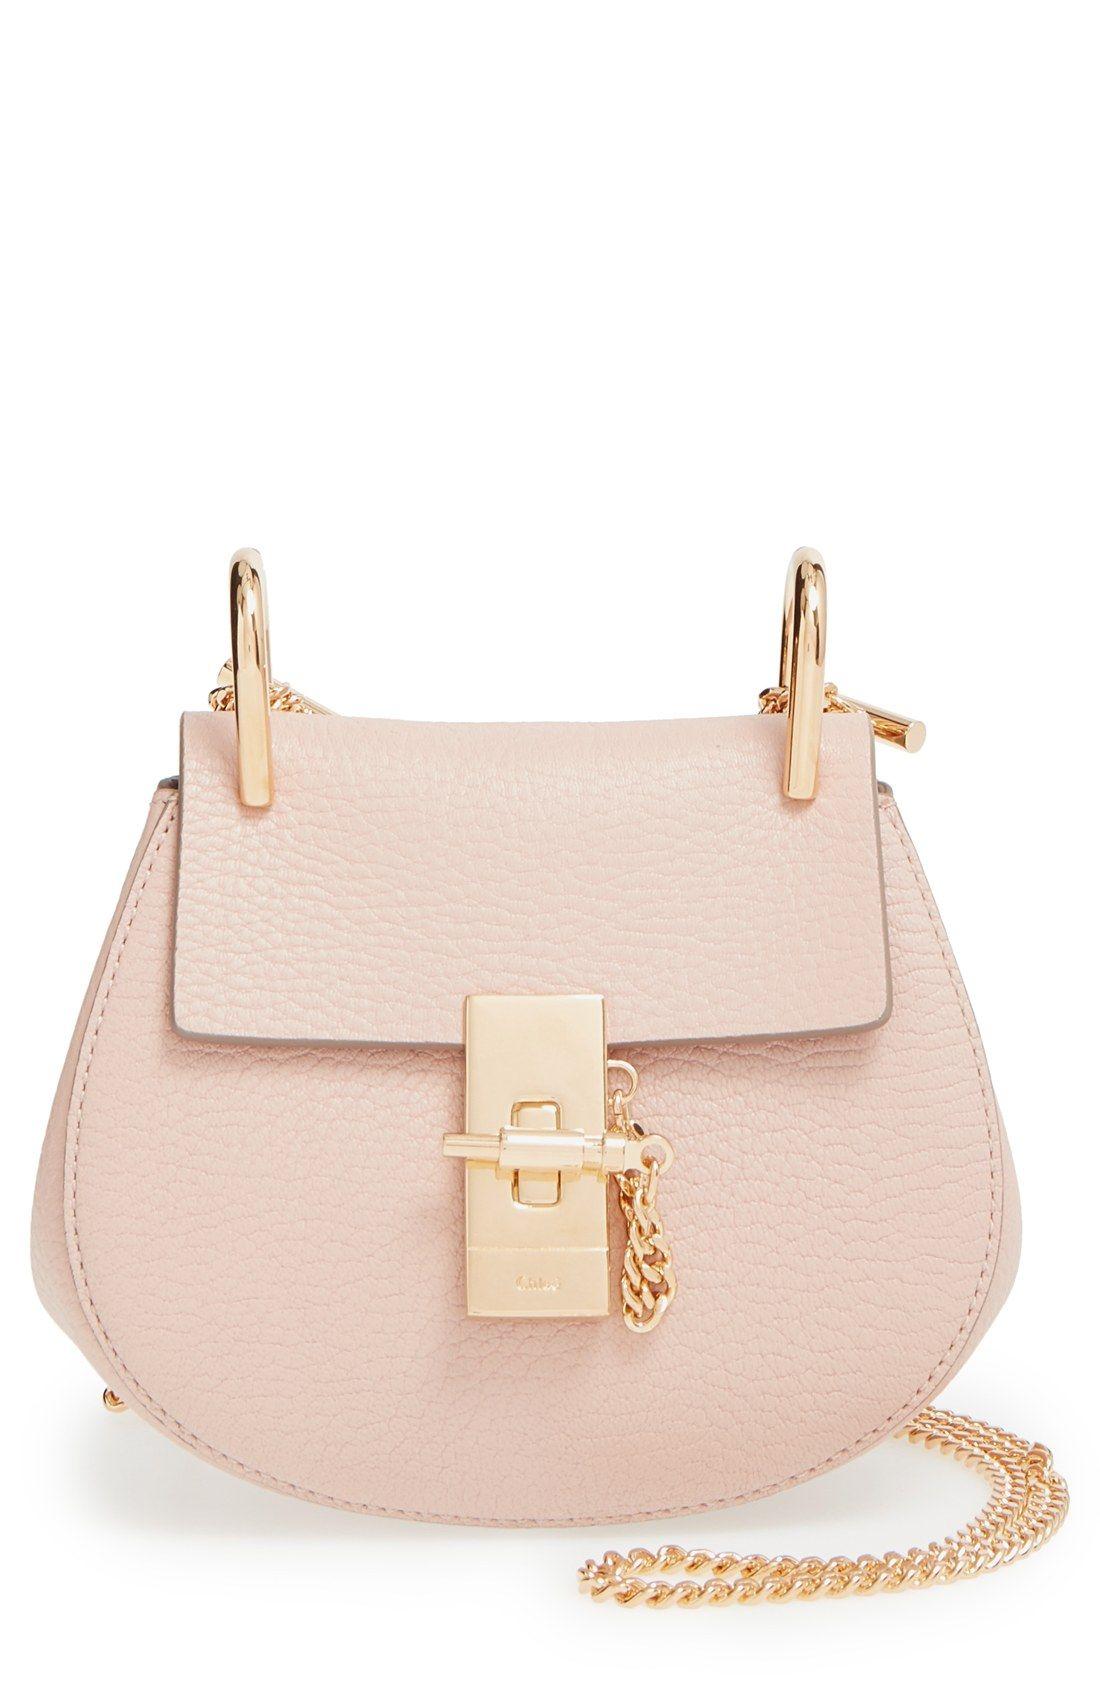 Chloé  Nano Drew  Lambskin Leather Shoulder Bag  99fdaa65b